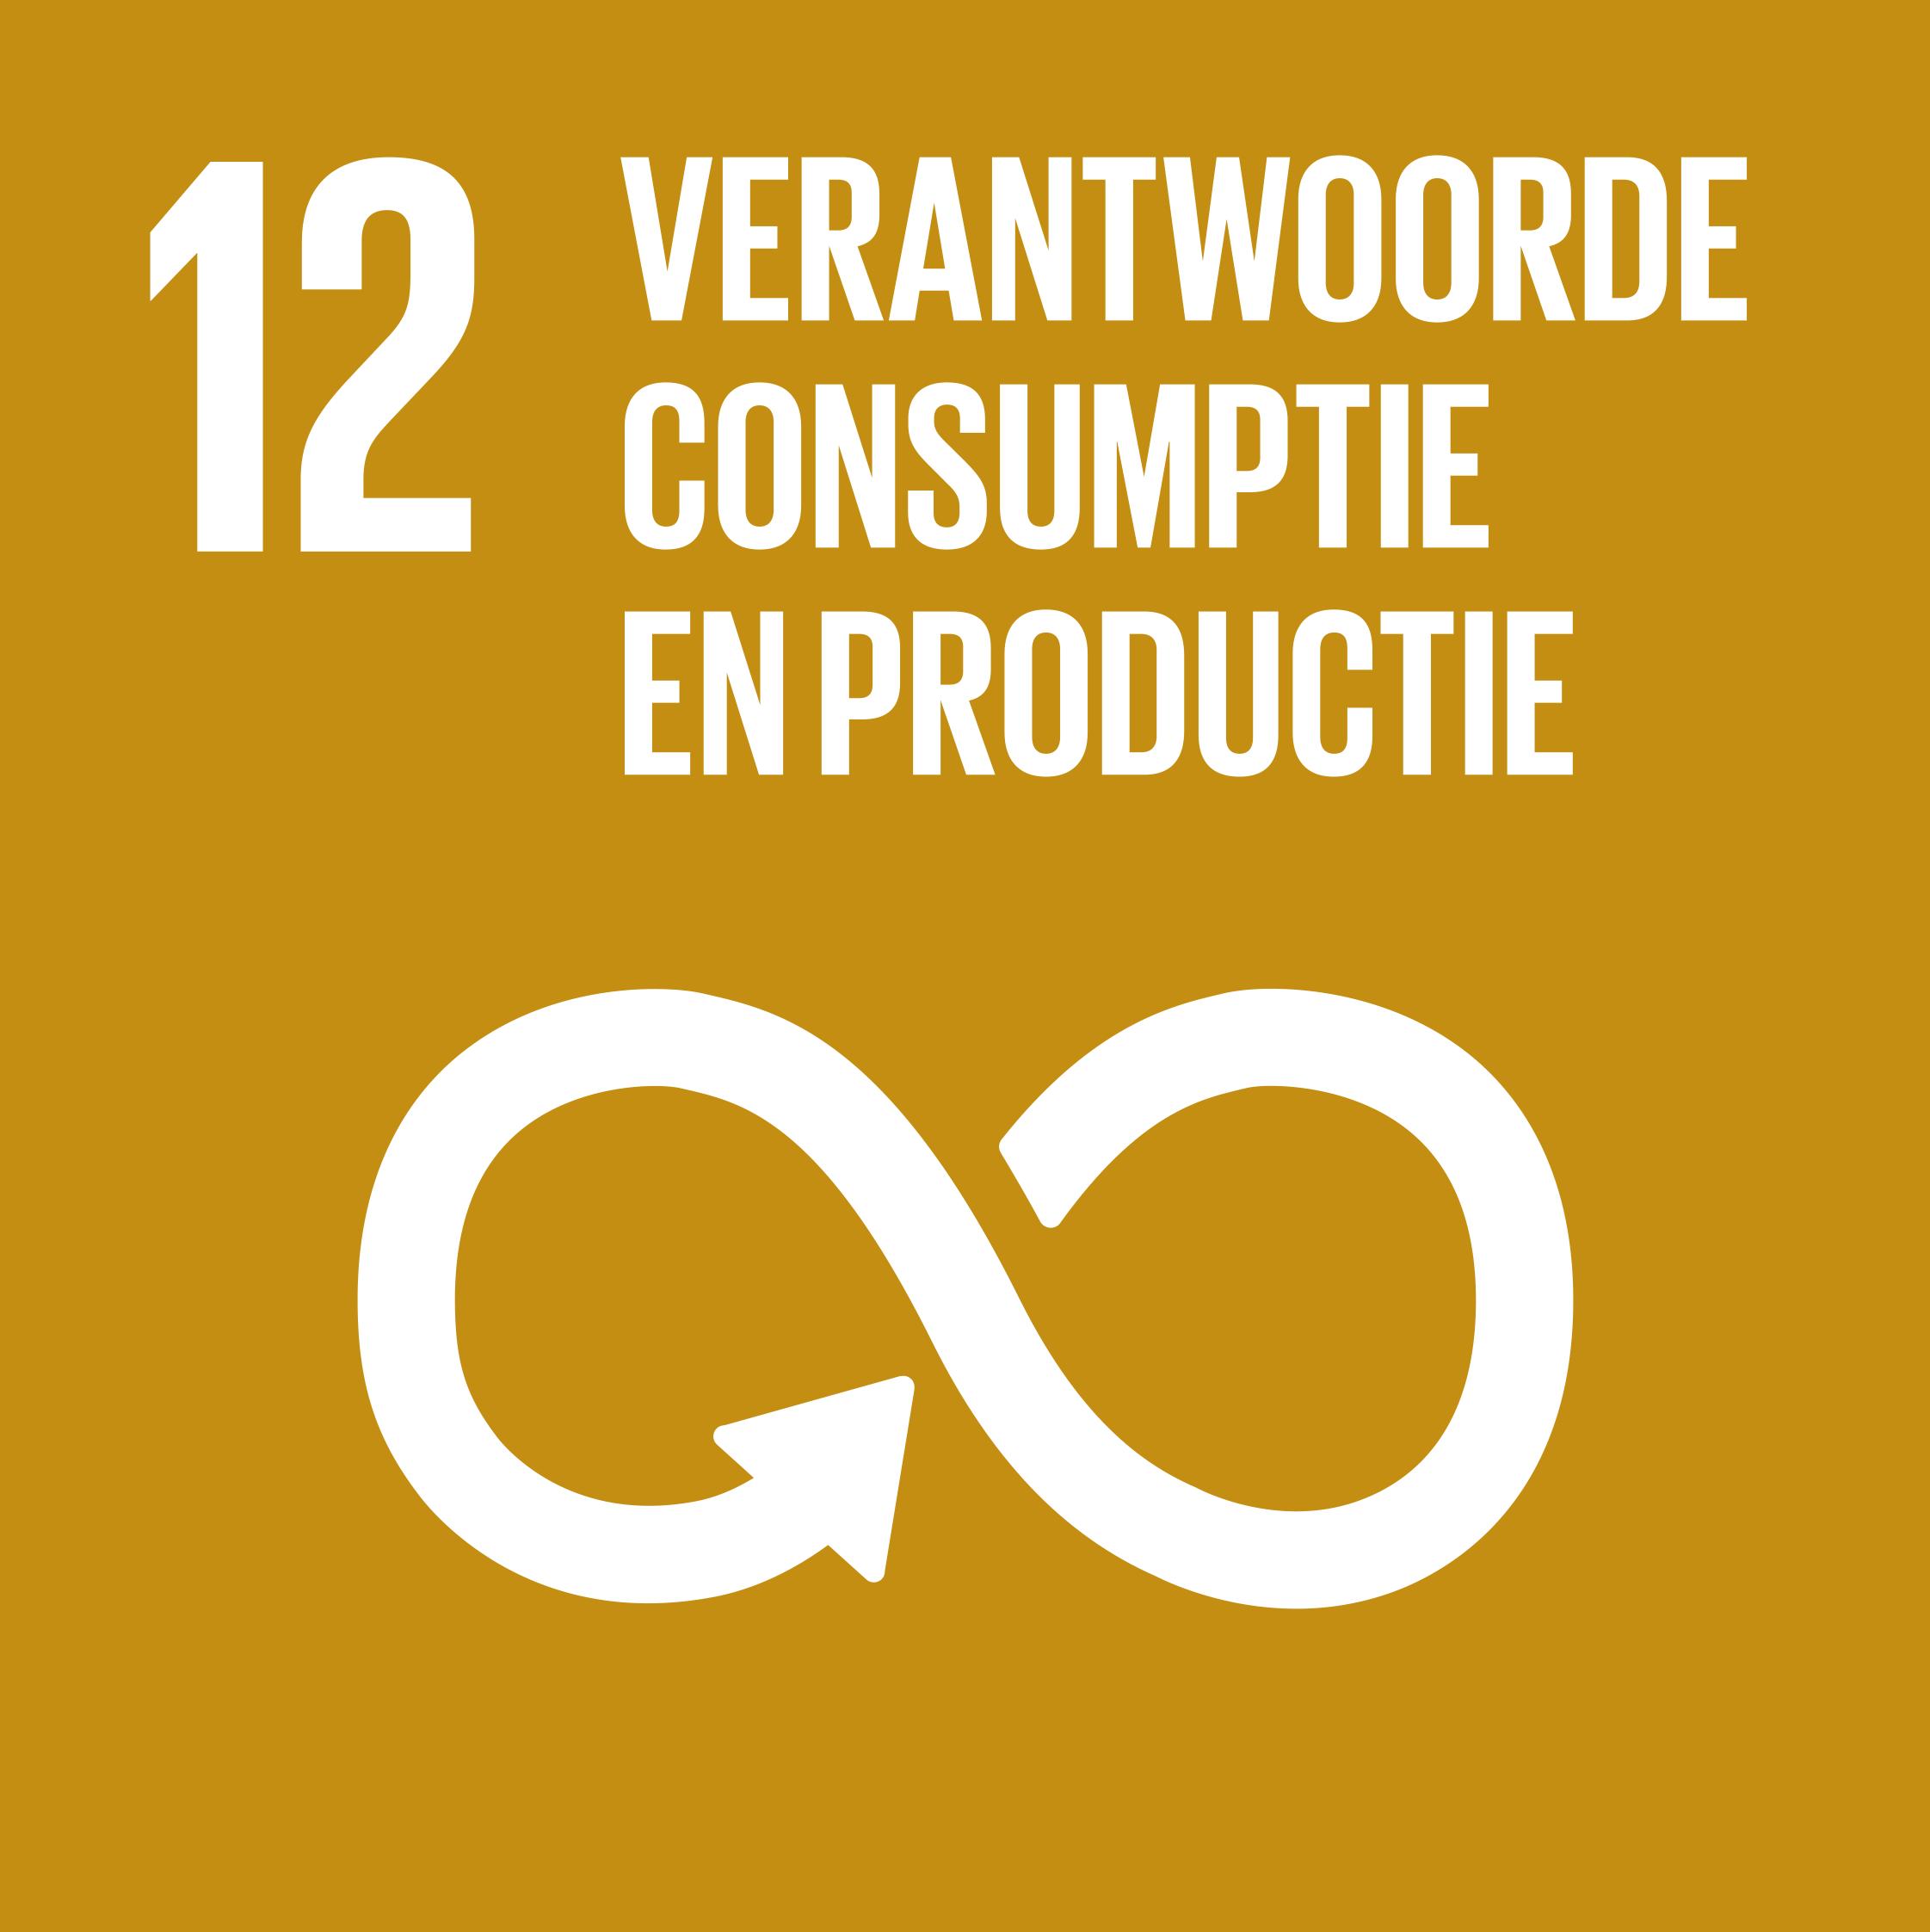 SDG_12.png